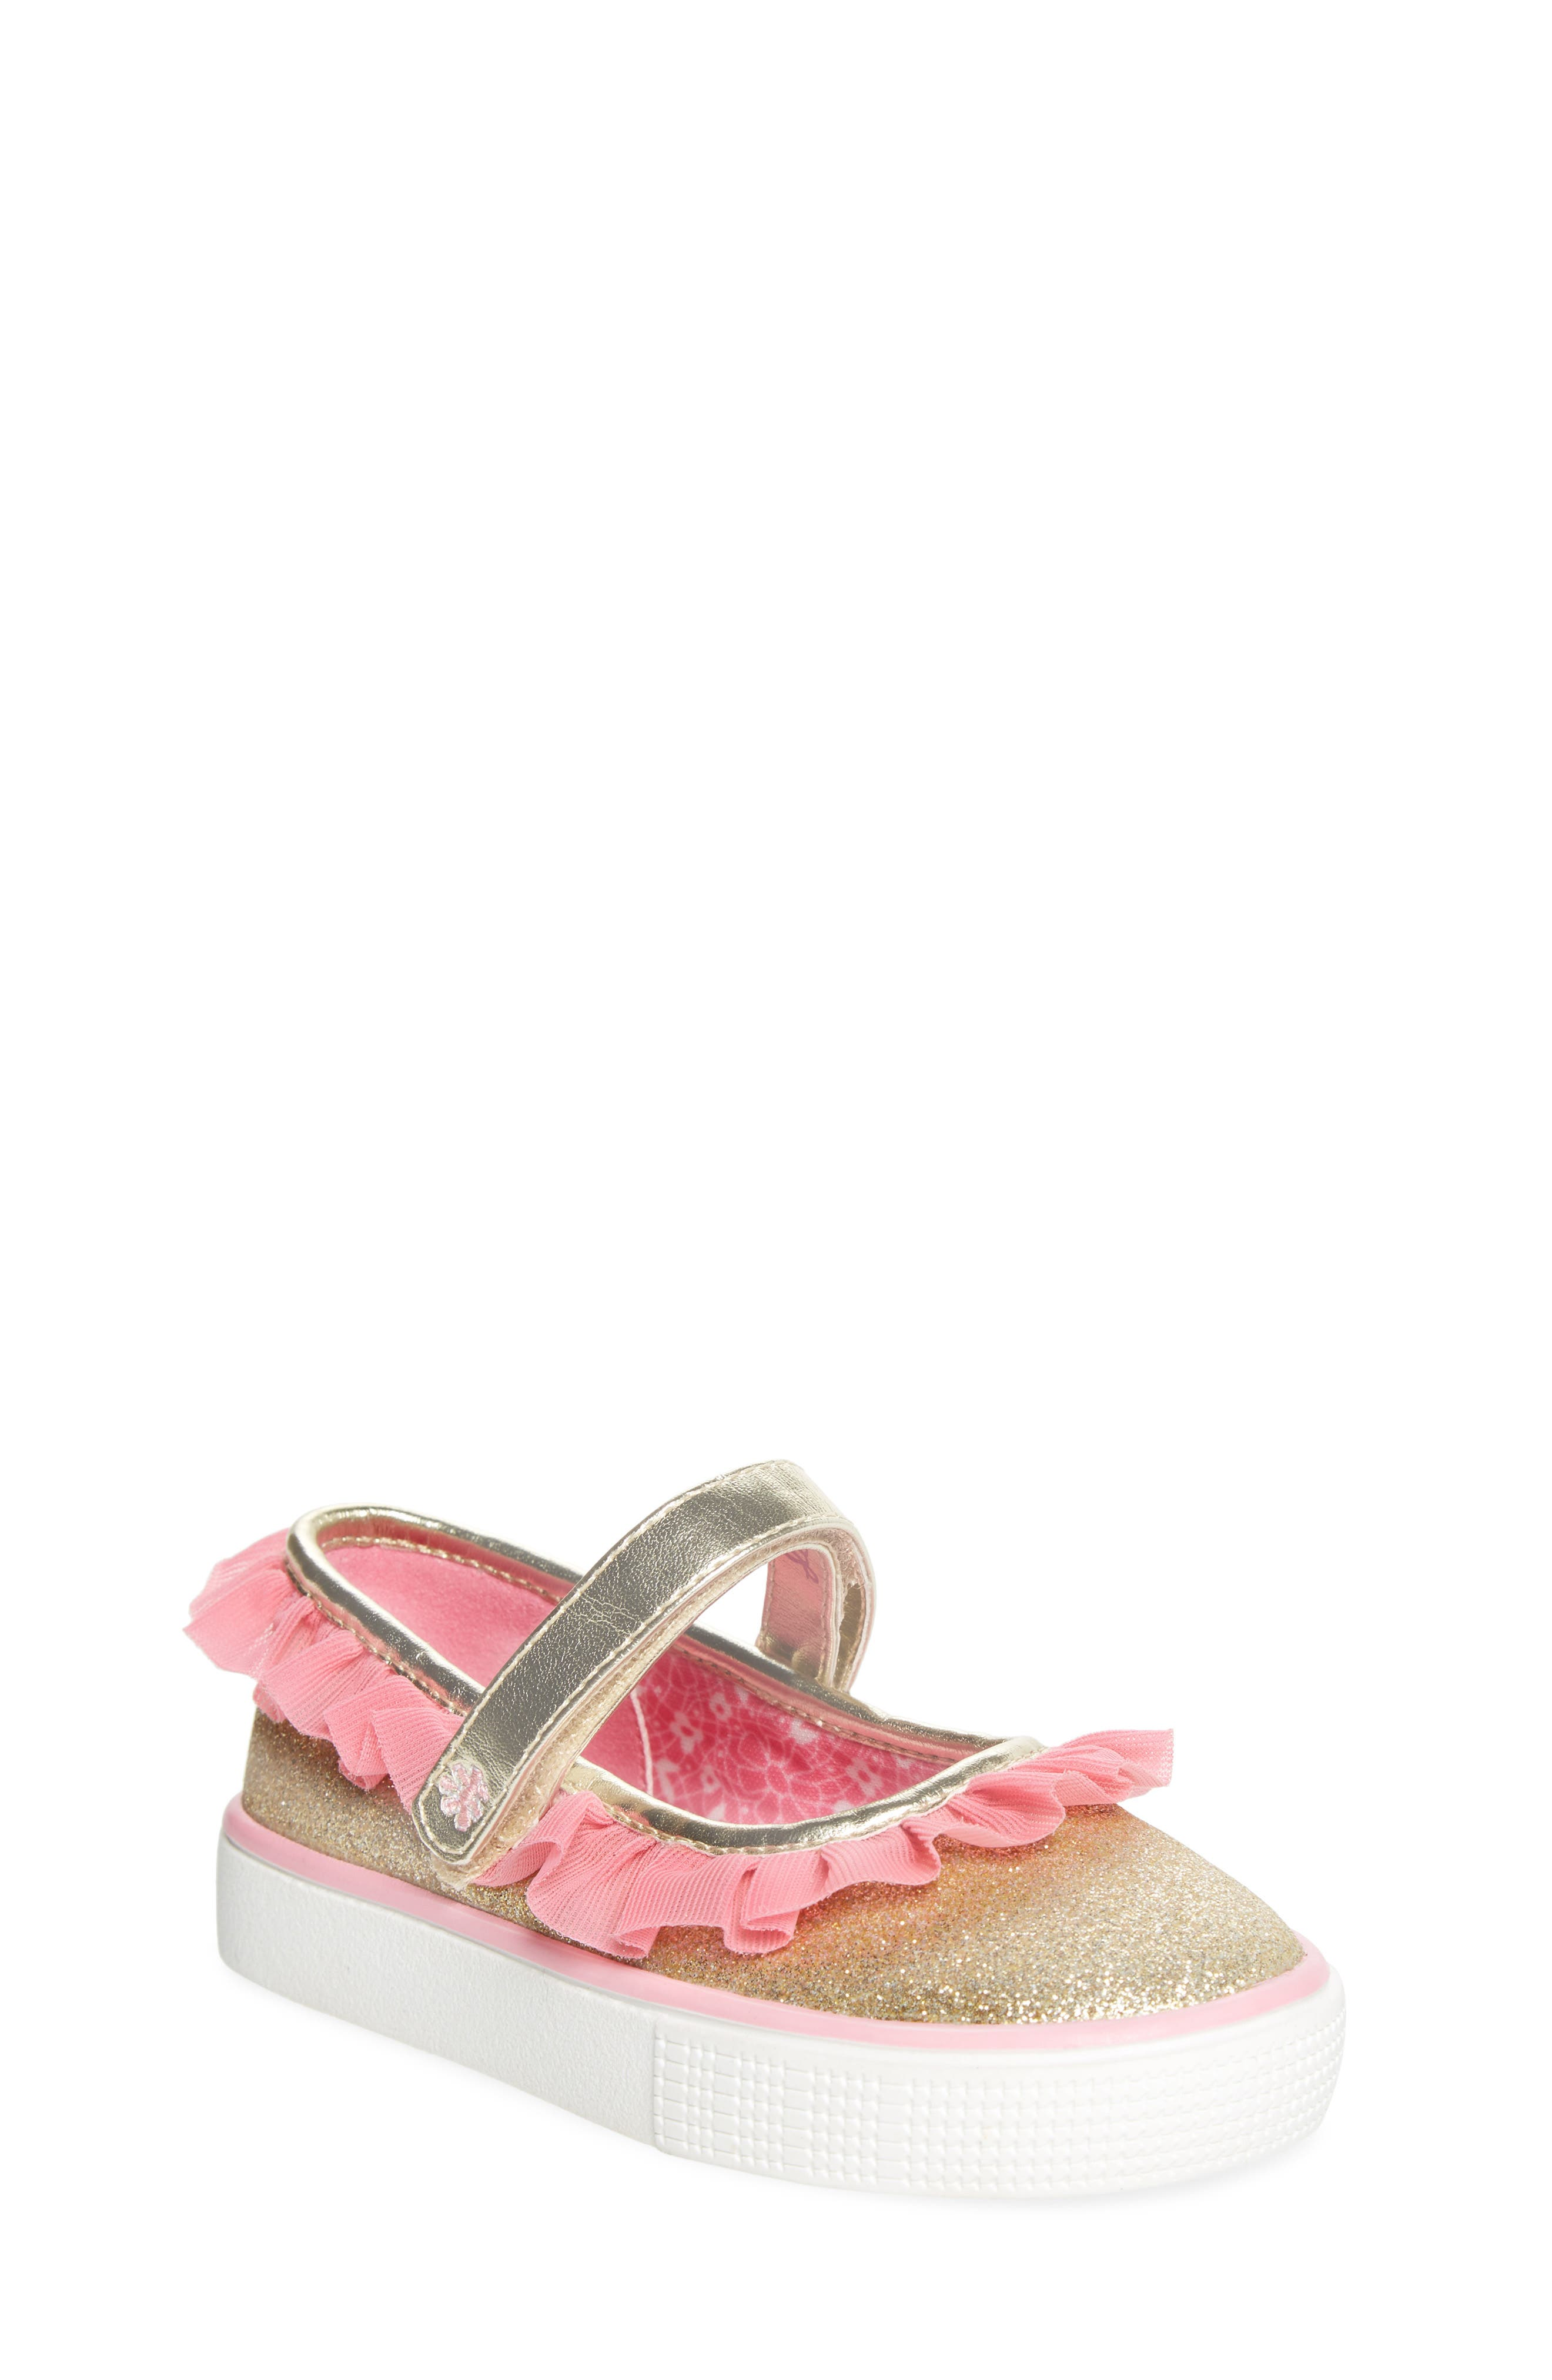 Ashlyn Tulle Mary Jane Sneaker,                             Main thumbnail 1, color,                             Gold